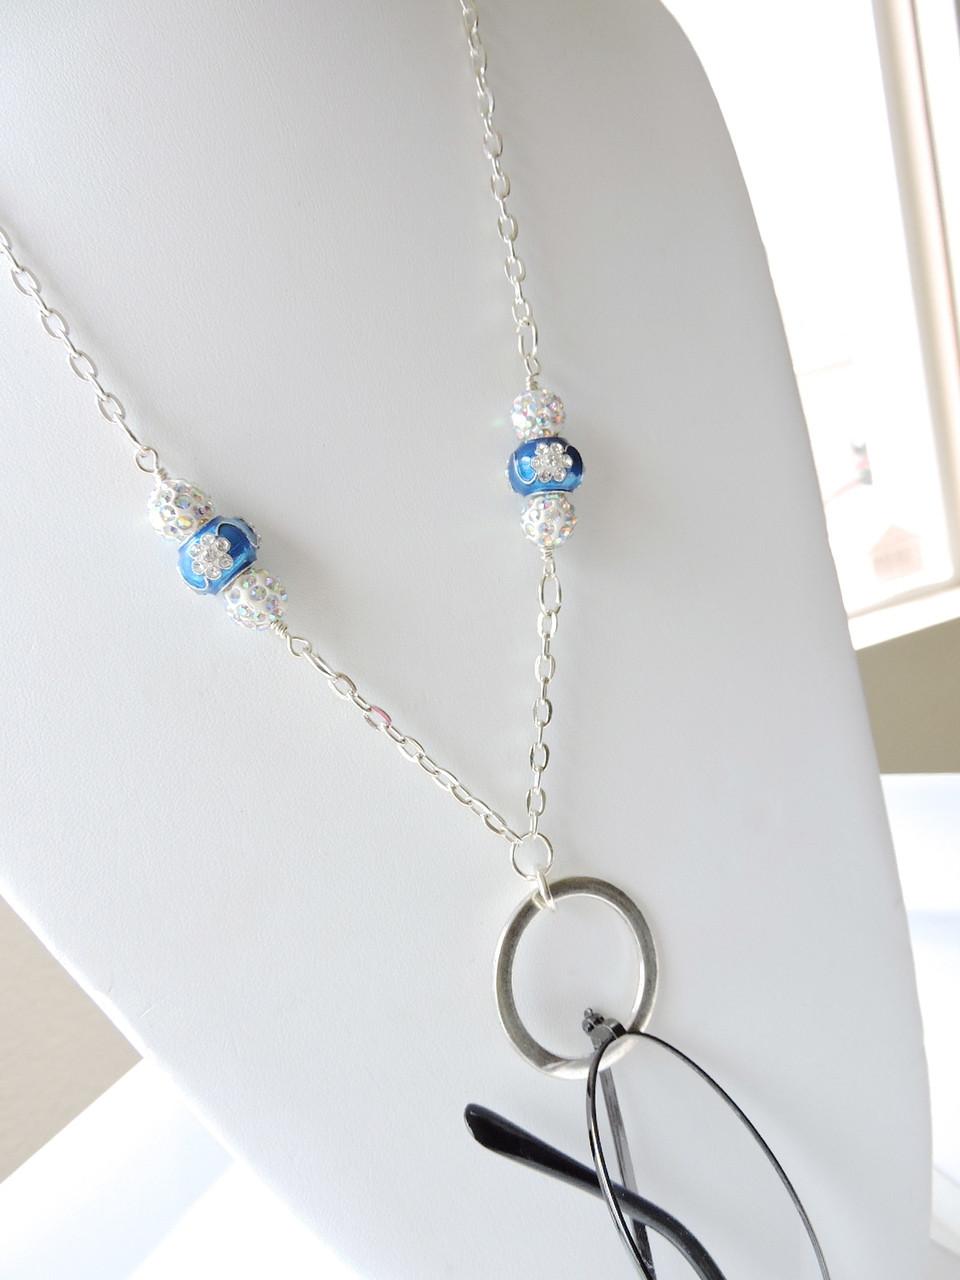 7f788b5fbf4 Eyeglasses Lanyard - Lovely Rhinestone Royal Blue n White Glasses Chain  Lanyard - Reading eyeglasses Holder